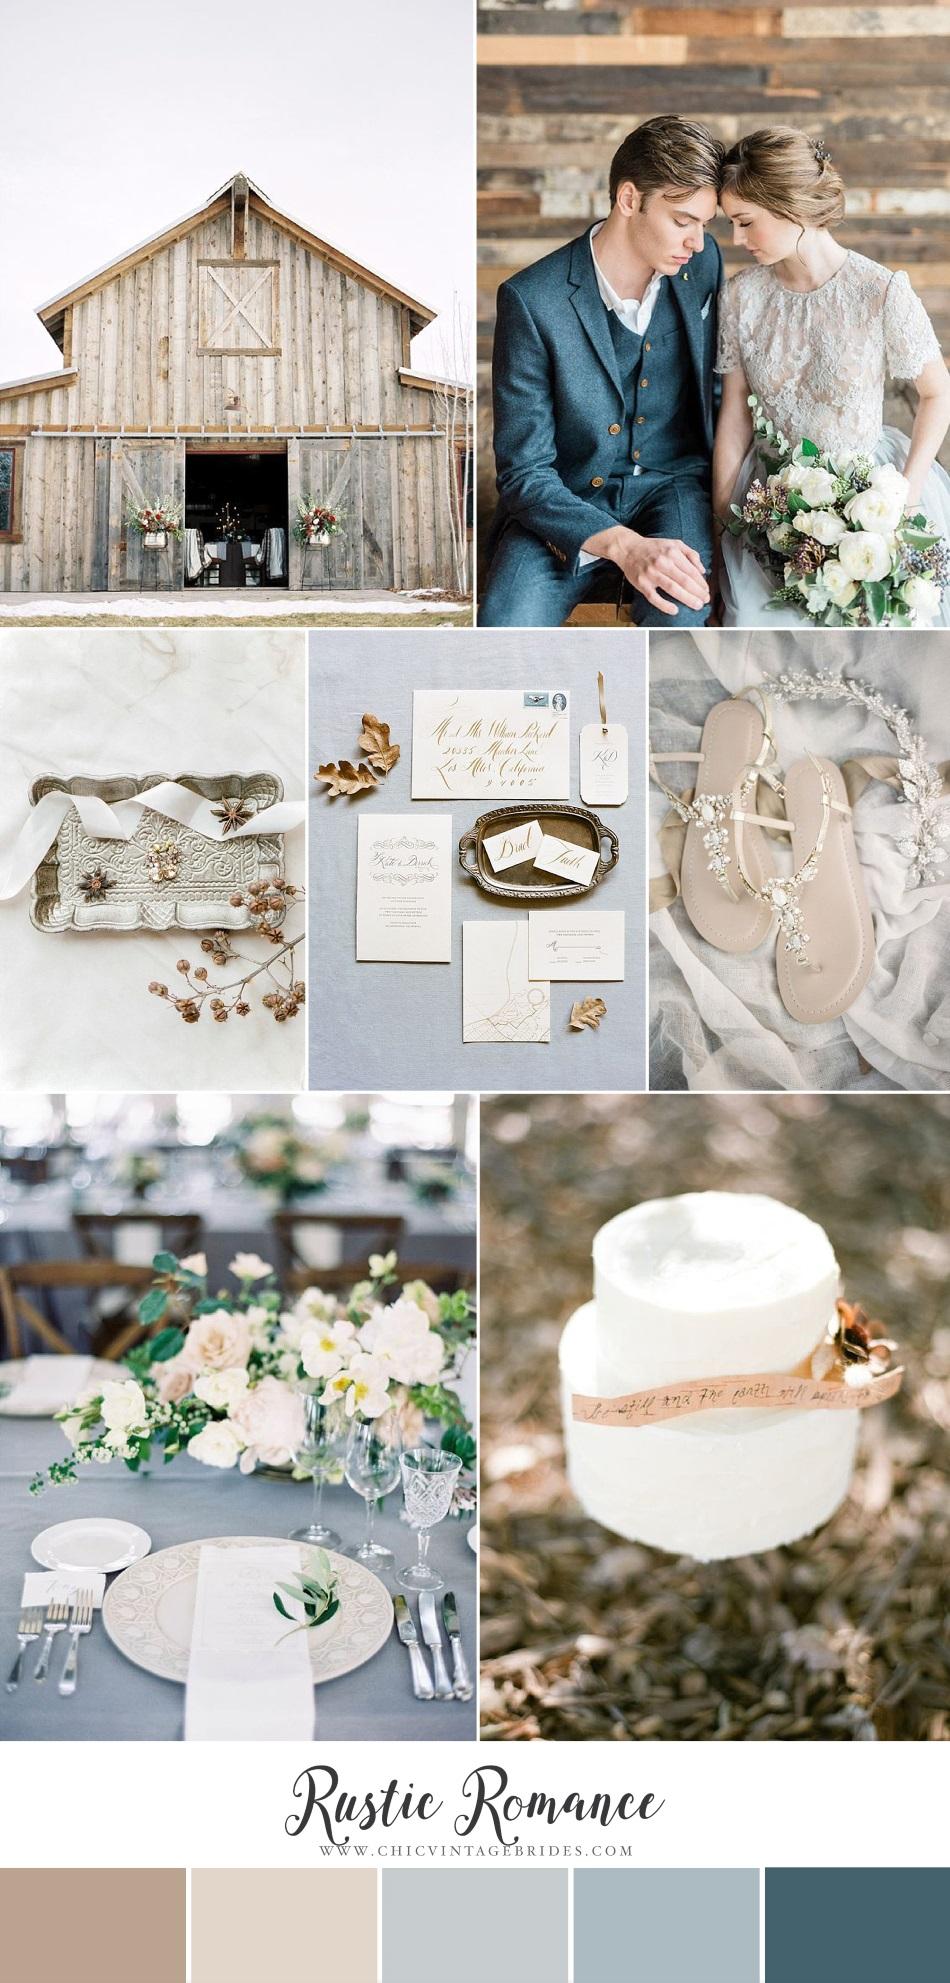 Rustic Romance - Beautiful Barn Wedding Inspiration in Blue & Neutrals